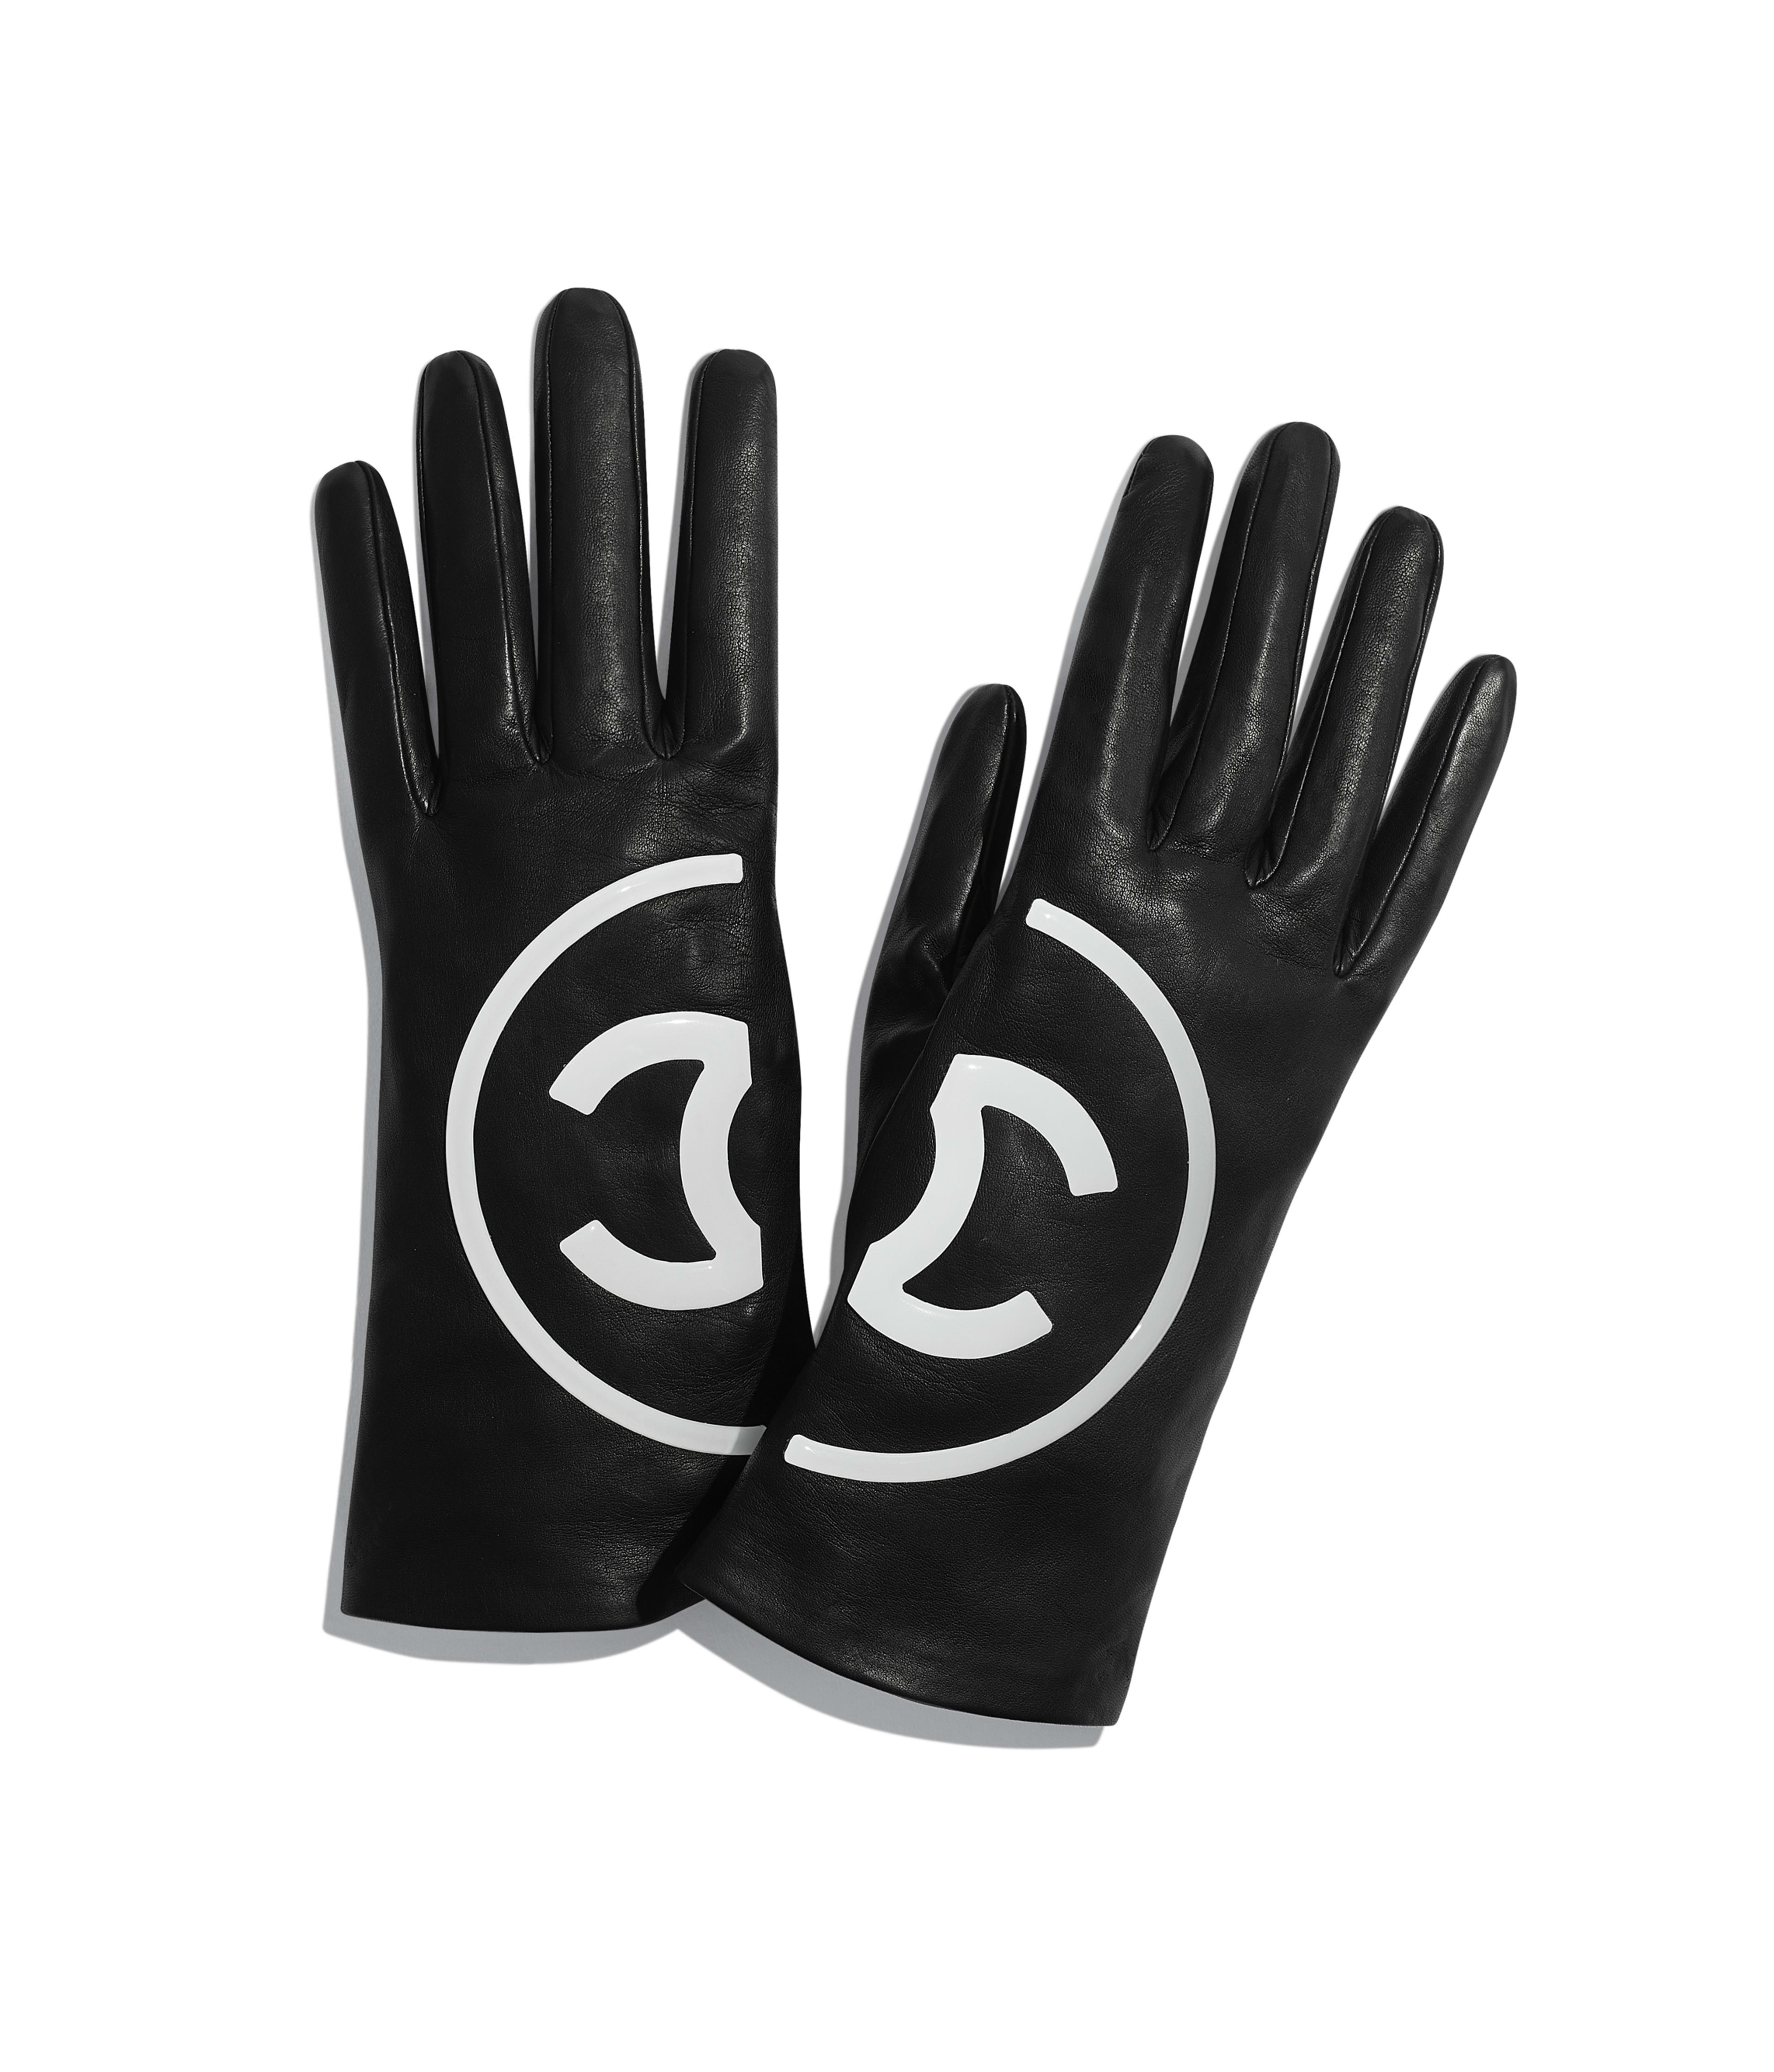 Chanel Bridal Gloves